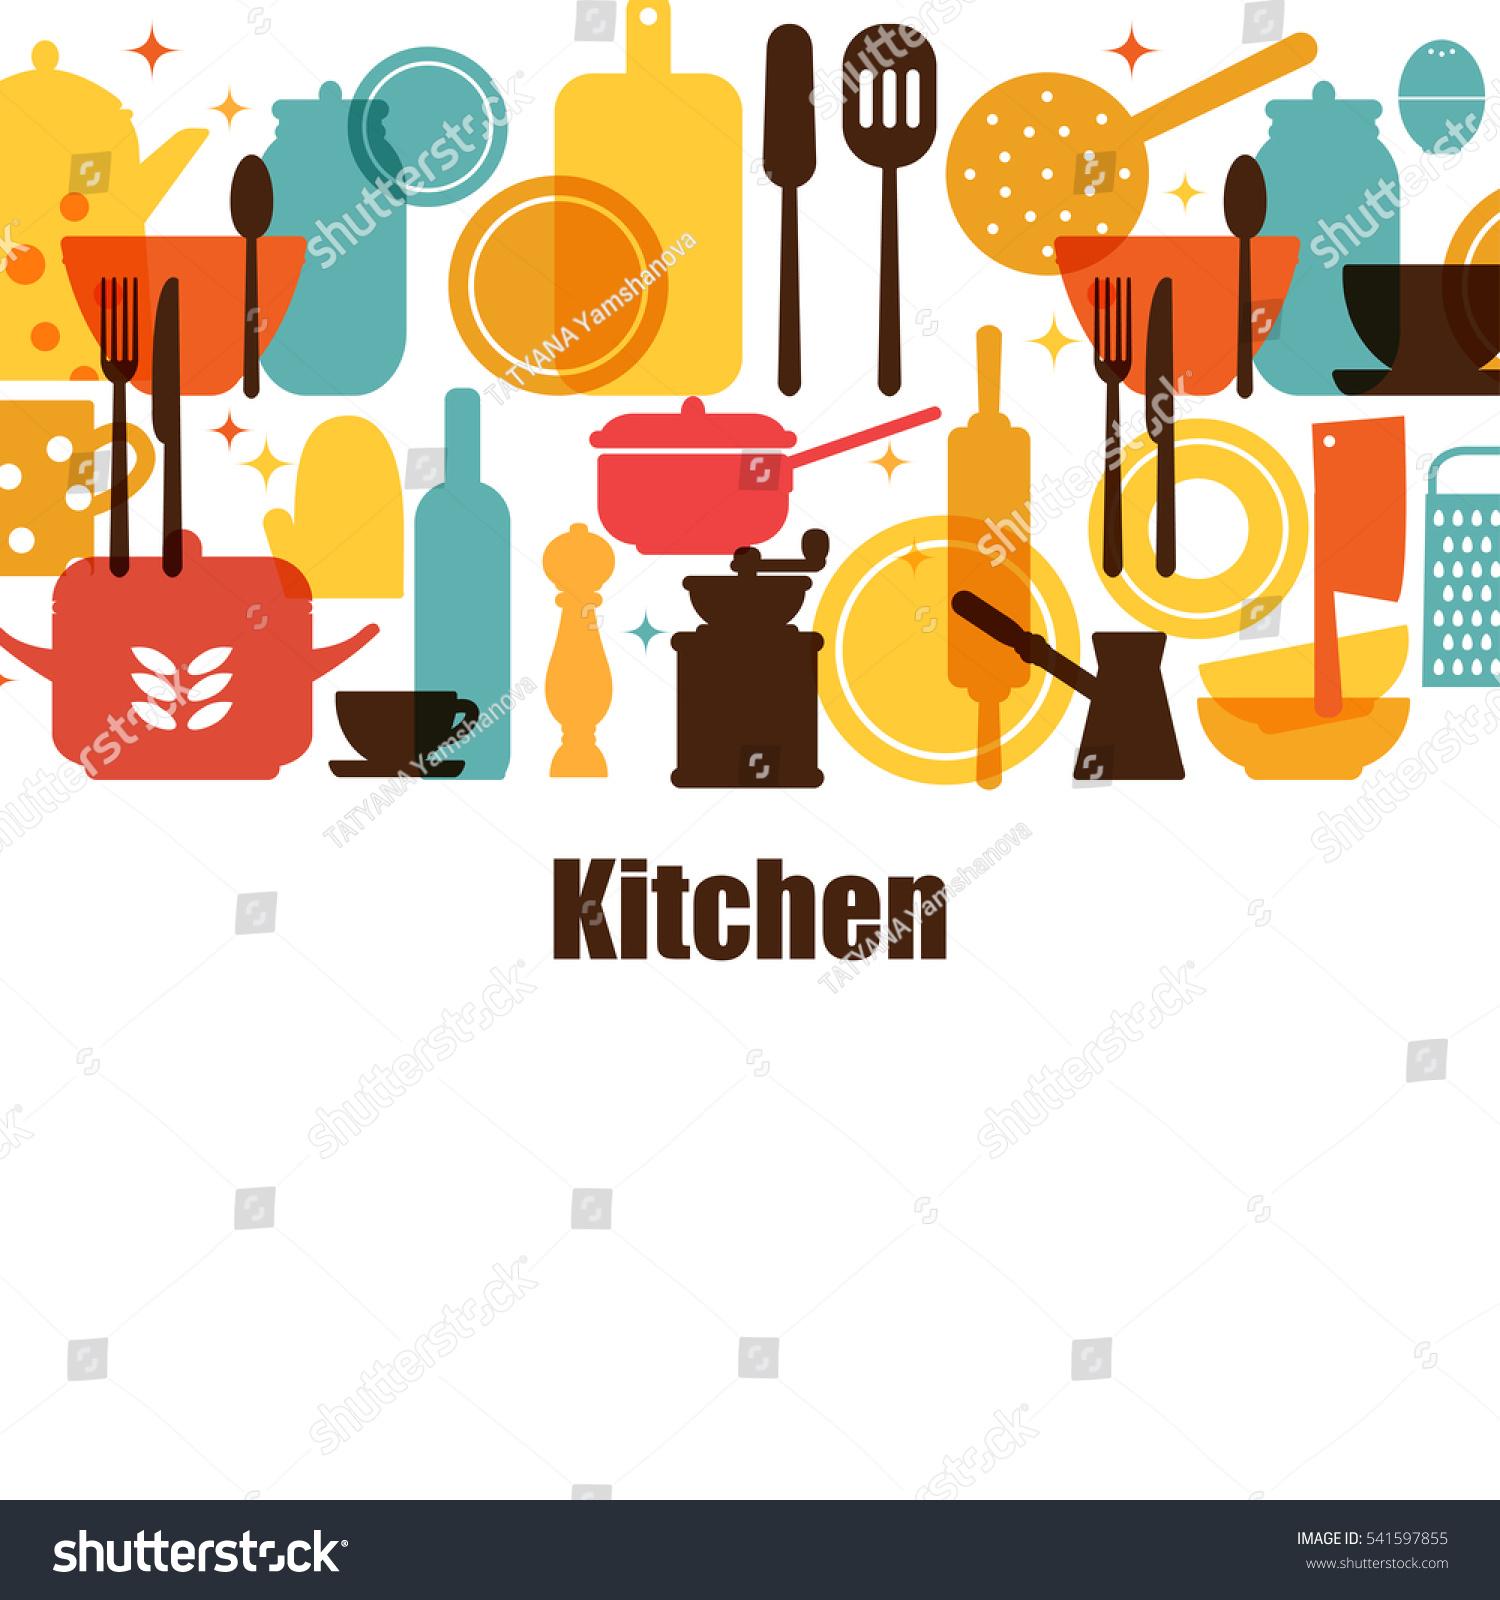 Vector set kitchen utensils cooking kitchen stock vector for Kitchen set video song